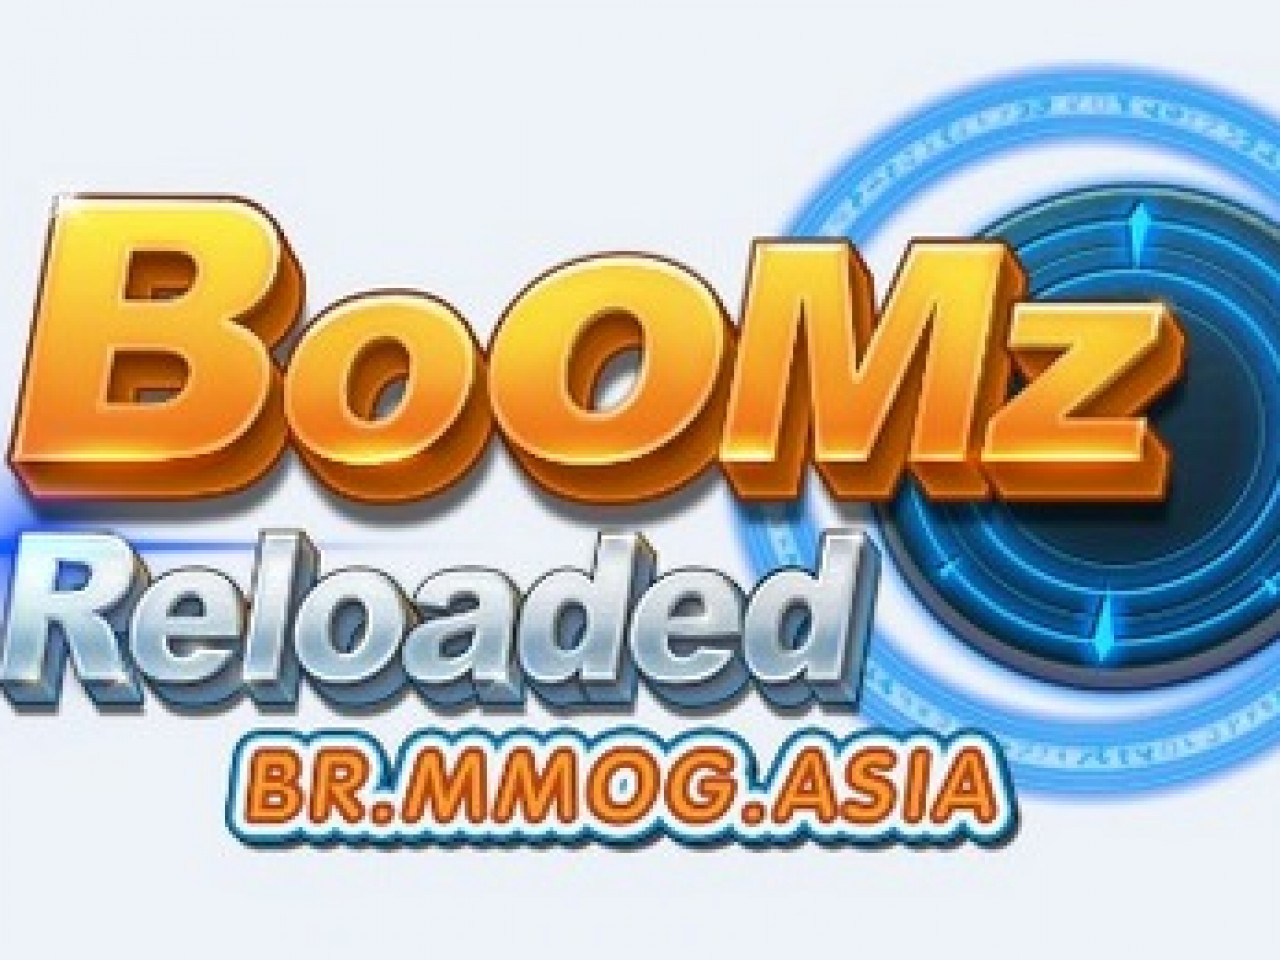 Boomz Reloaded พร้อมแล้ว CBT 9 มกราคมนี้ ด้วยระบบใหม่ สด เทพ!